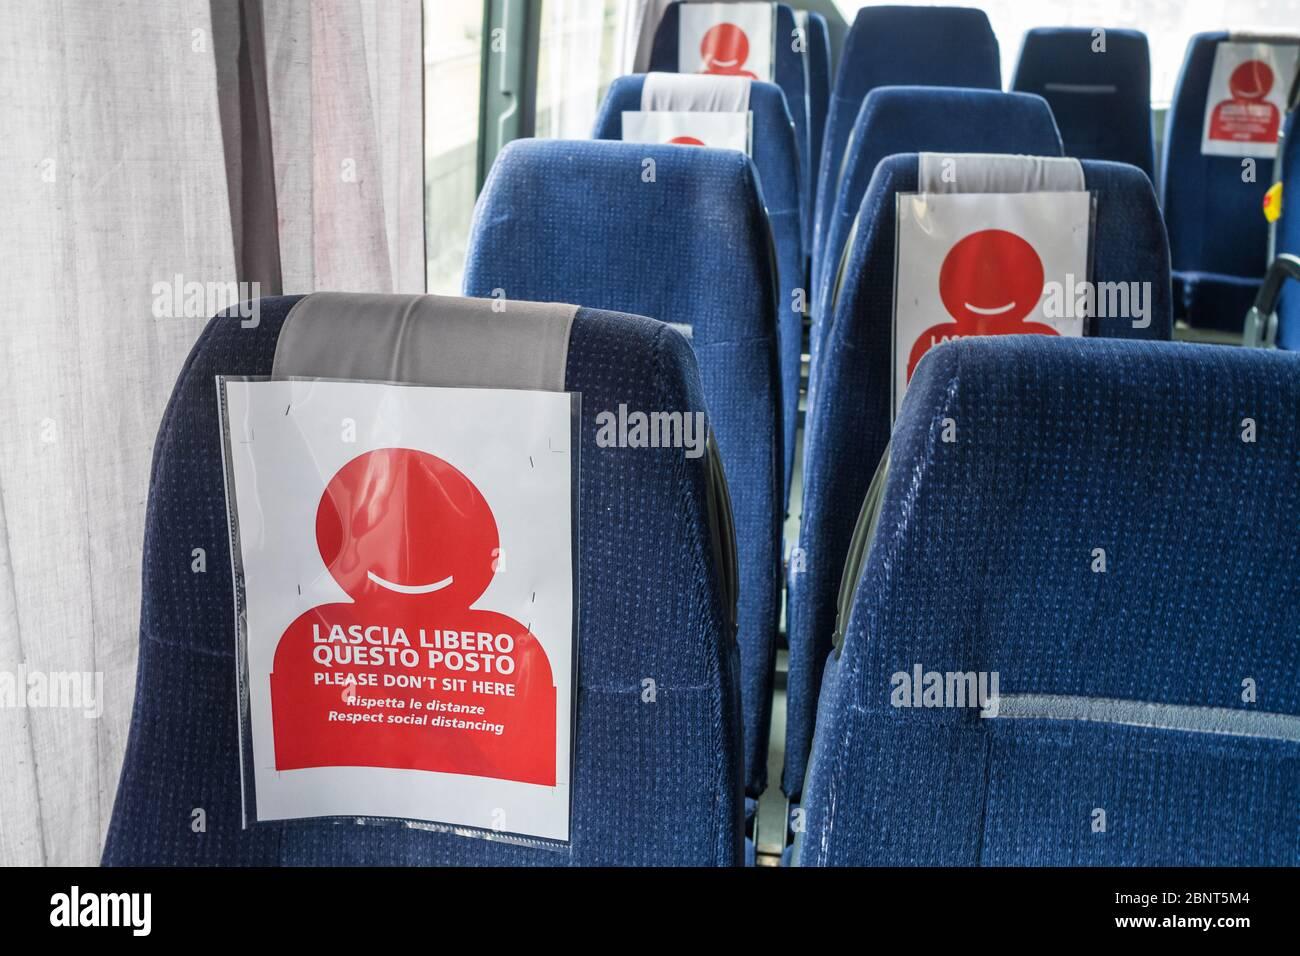 COVID-19 Public transport bus during the coronavirus pandemic. Stock Photo